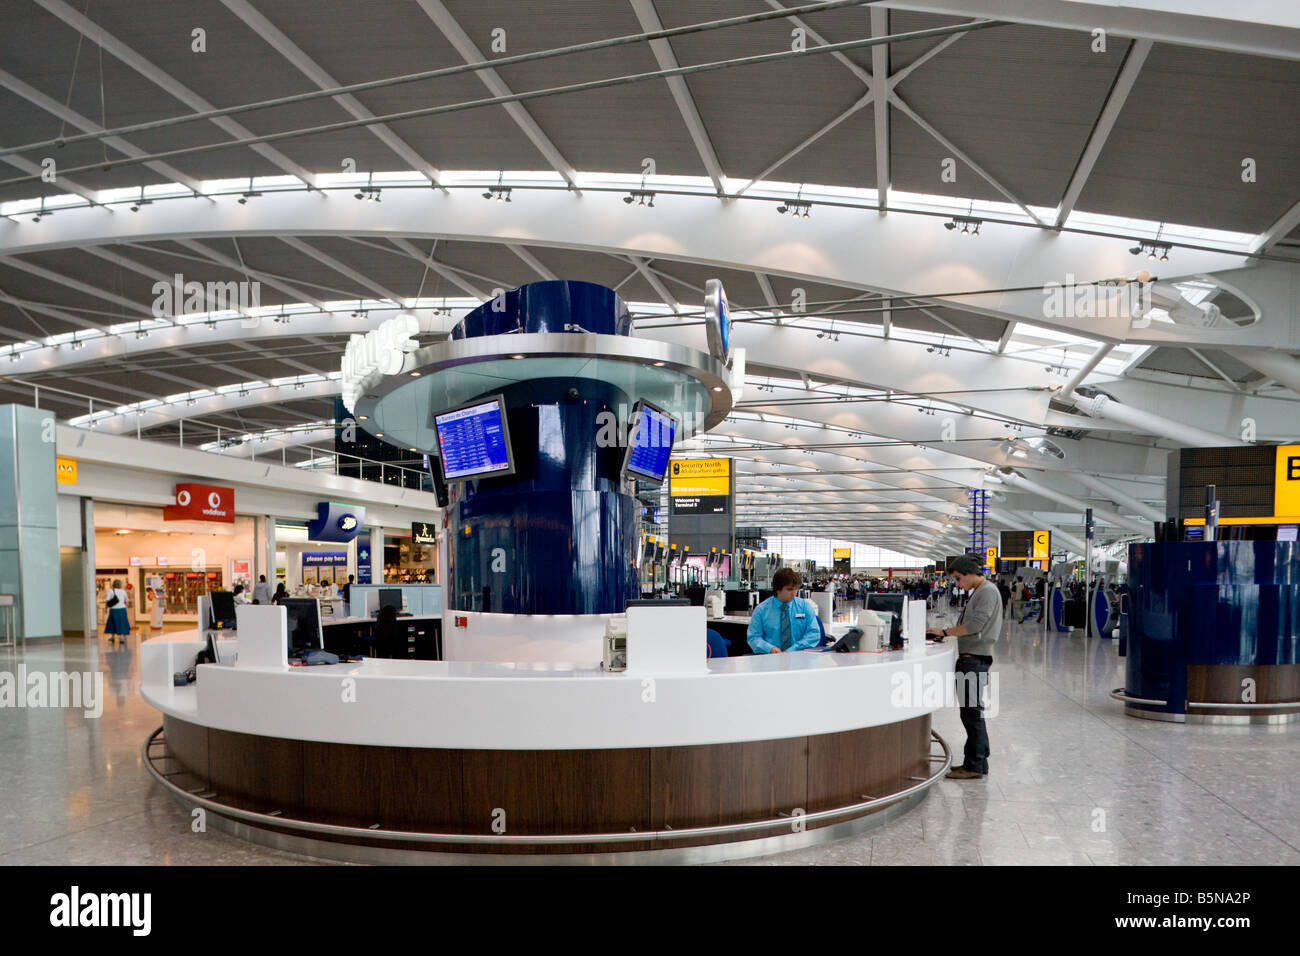 inormation desk, Terminal 5, Heathrow, London, England - Stock Image